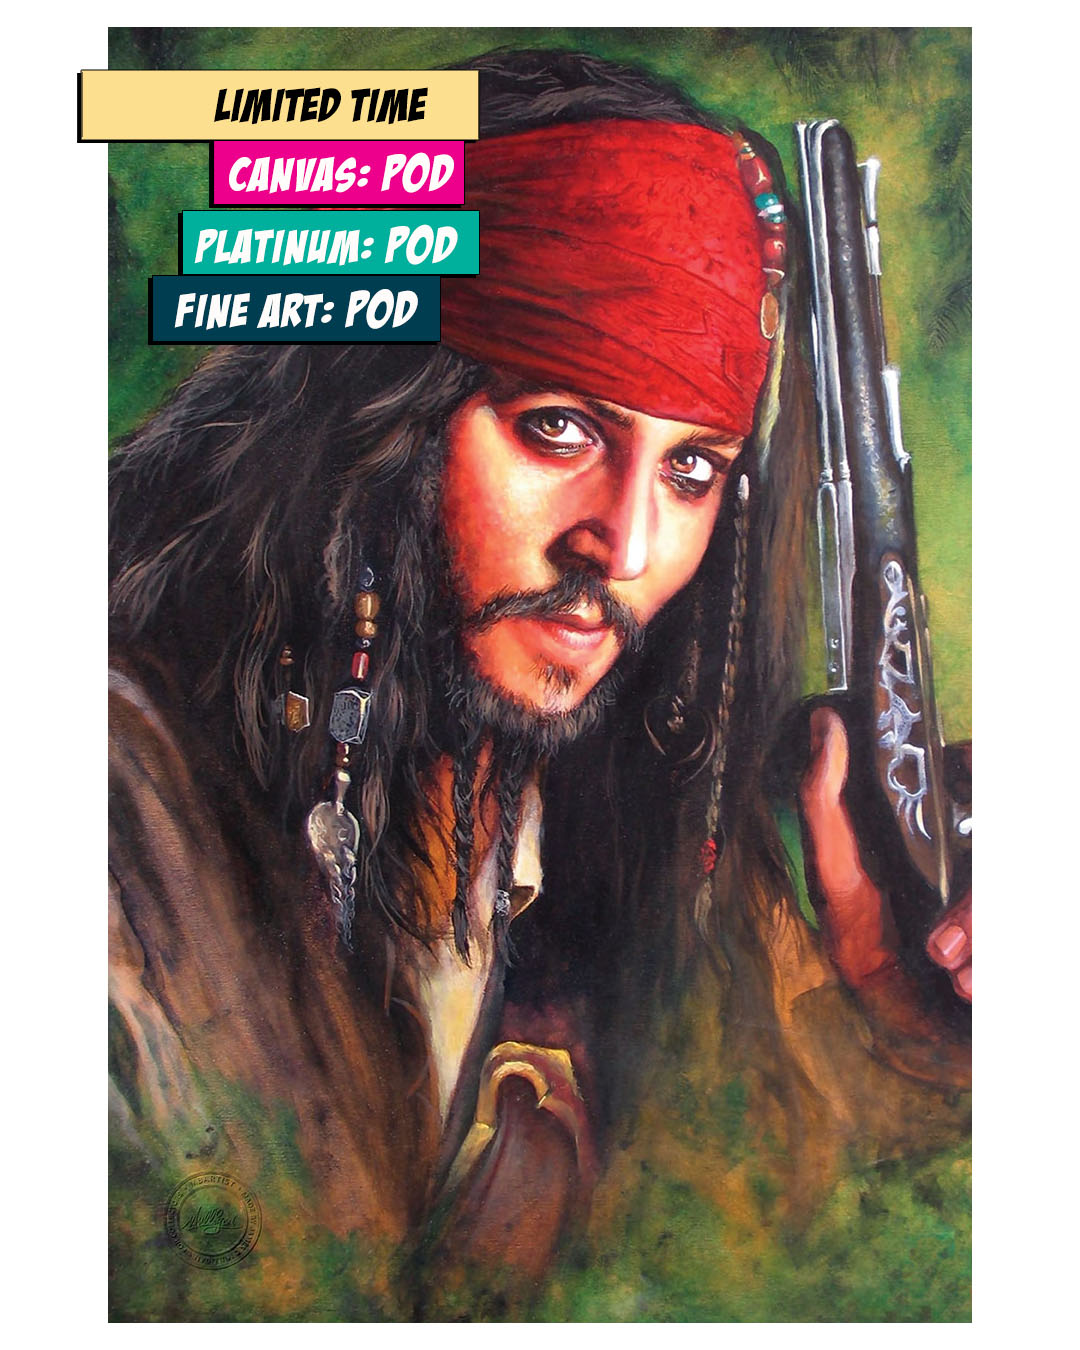 PIRATES OF THE CARRIBEAN: CAPTAIN JACK SPARROW